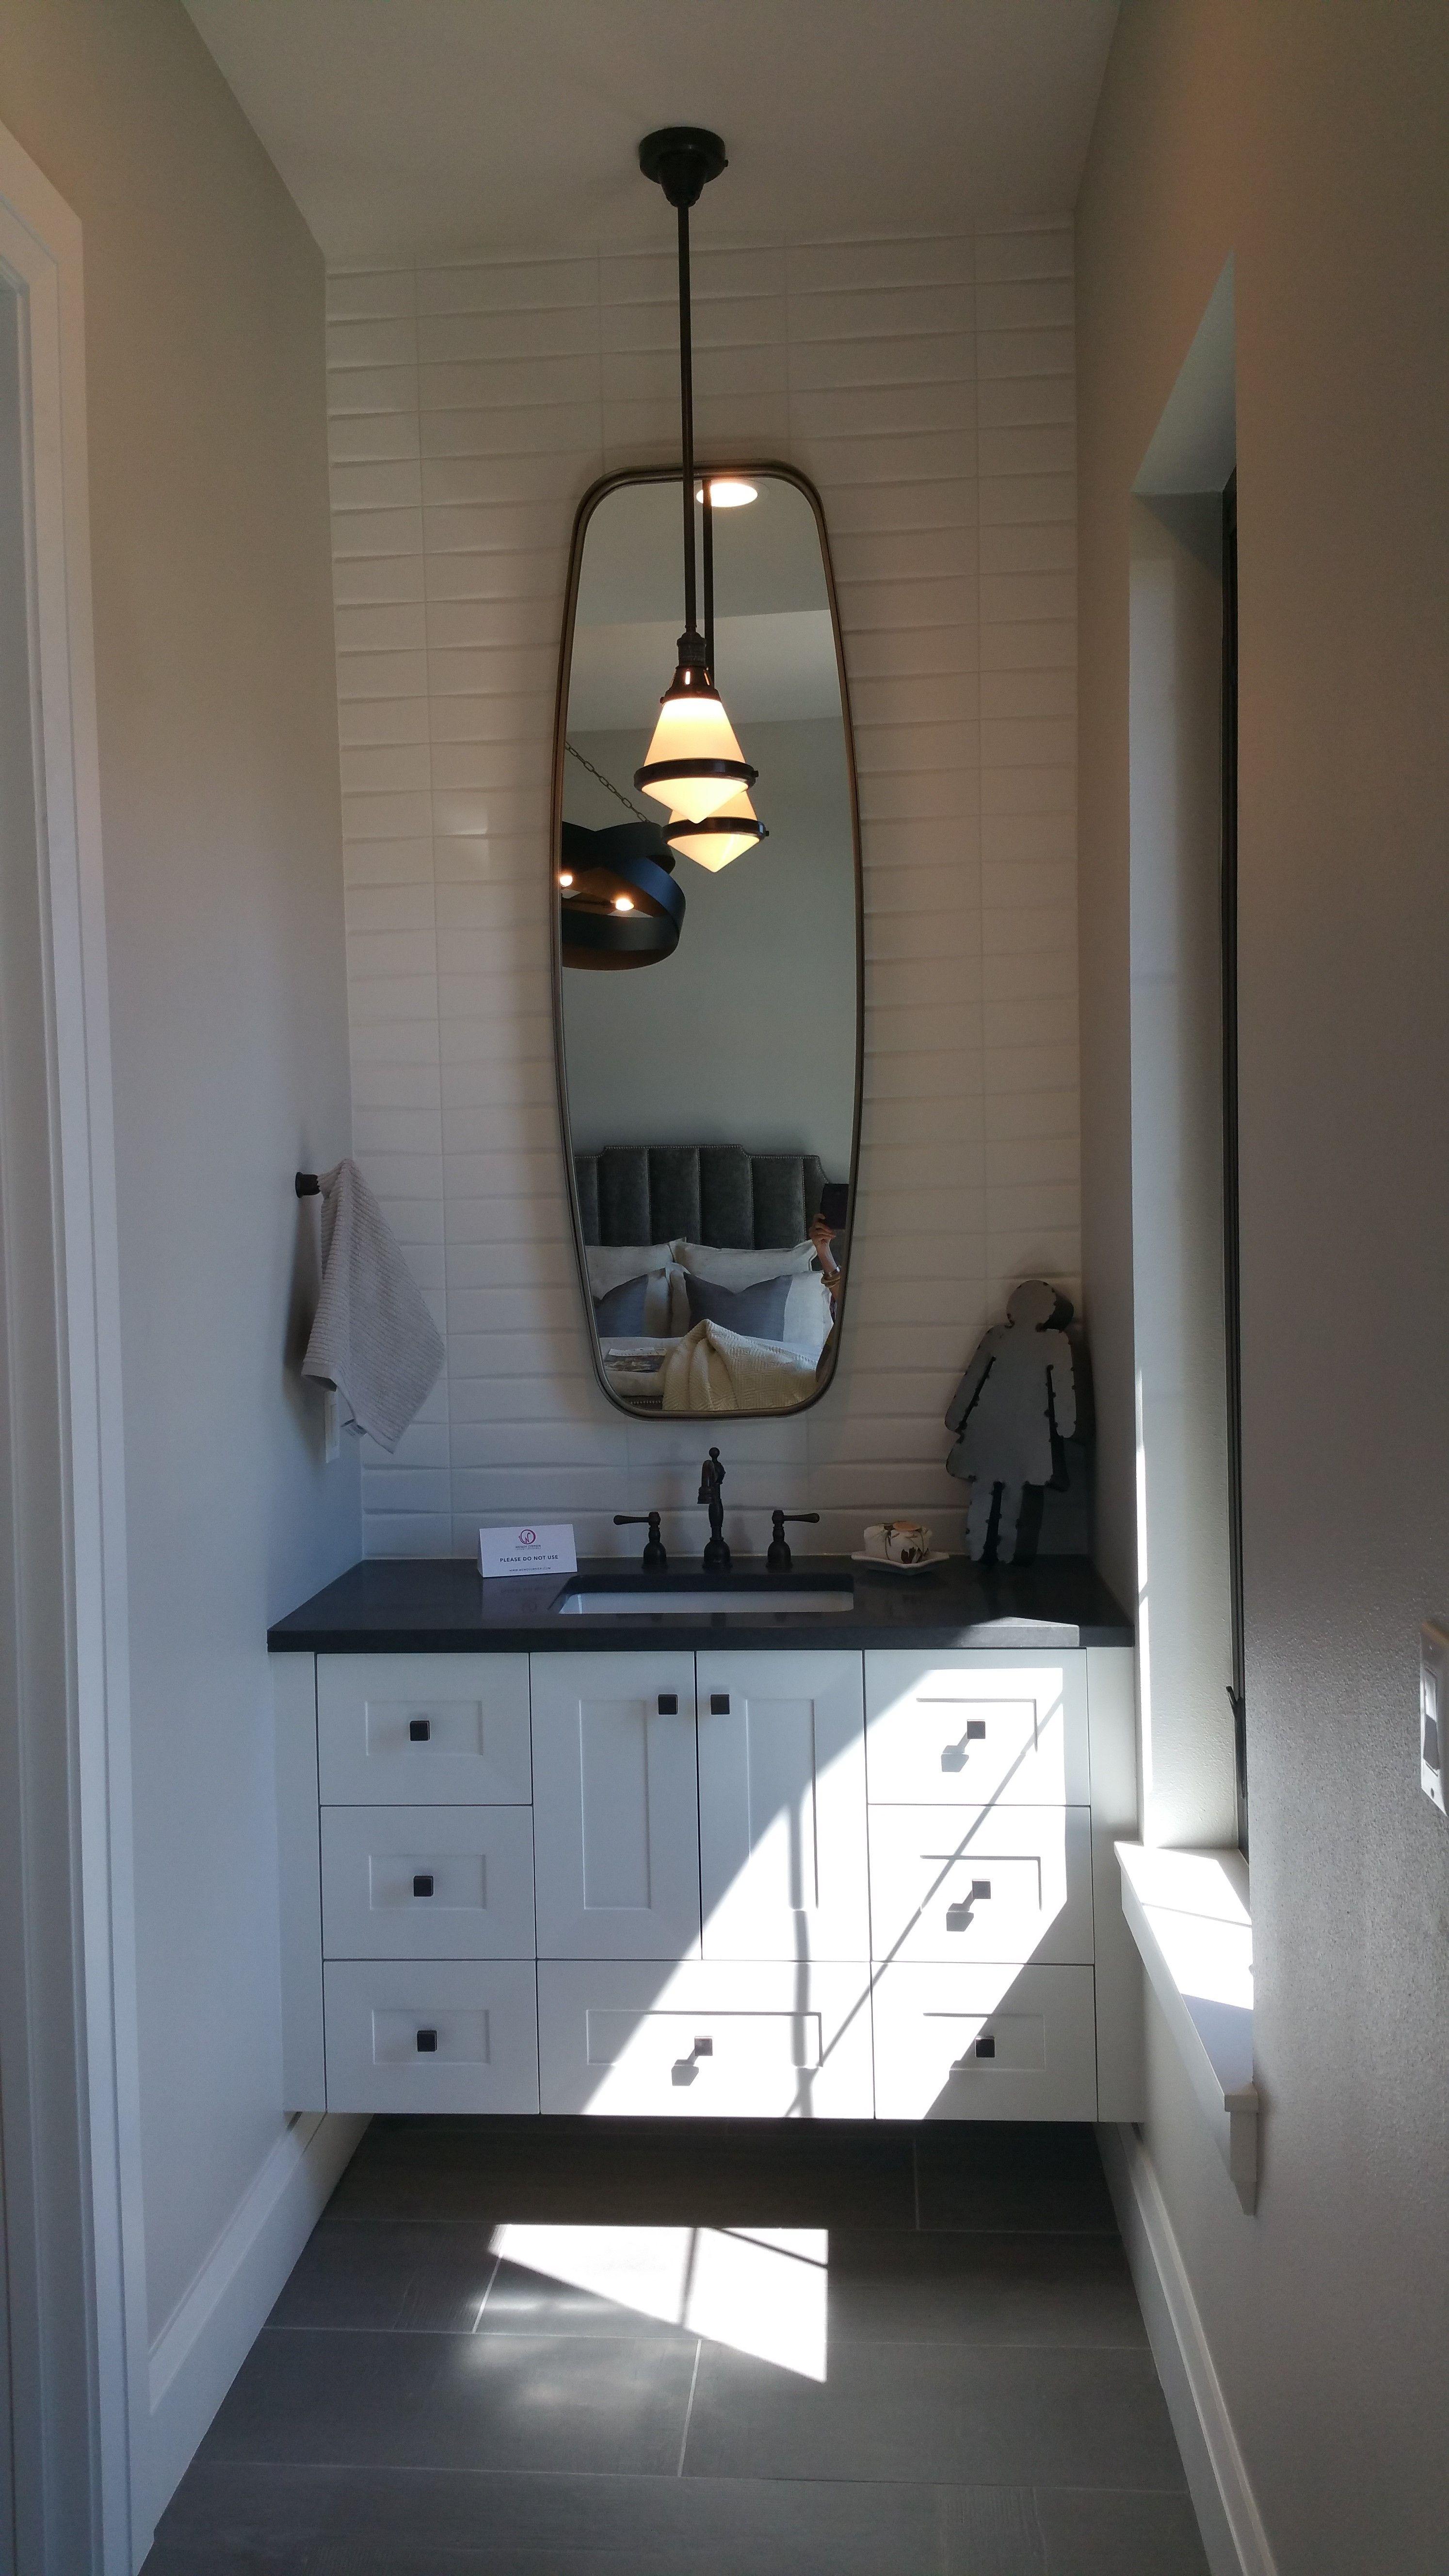 idea for mirror Master bath | Mirror, Bathroom lighting